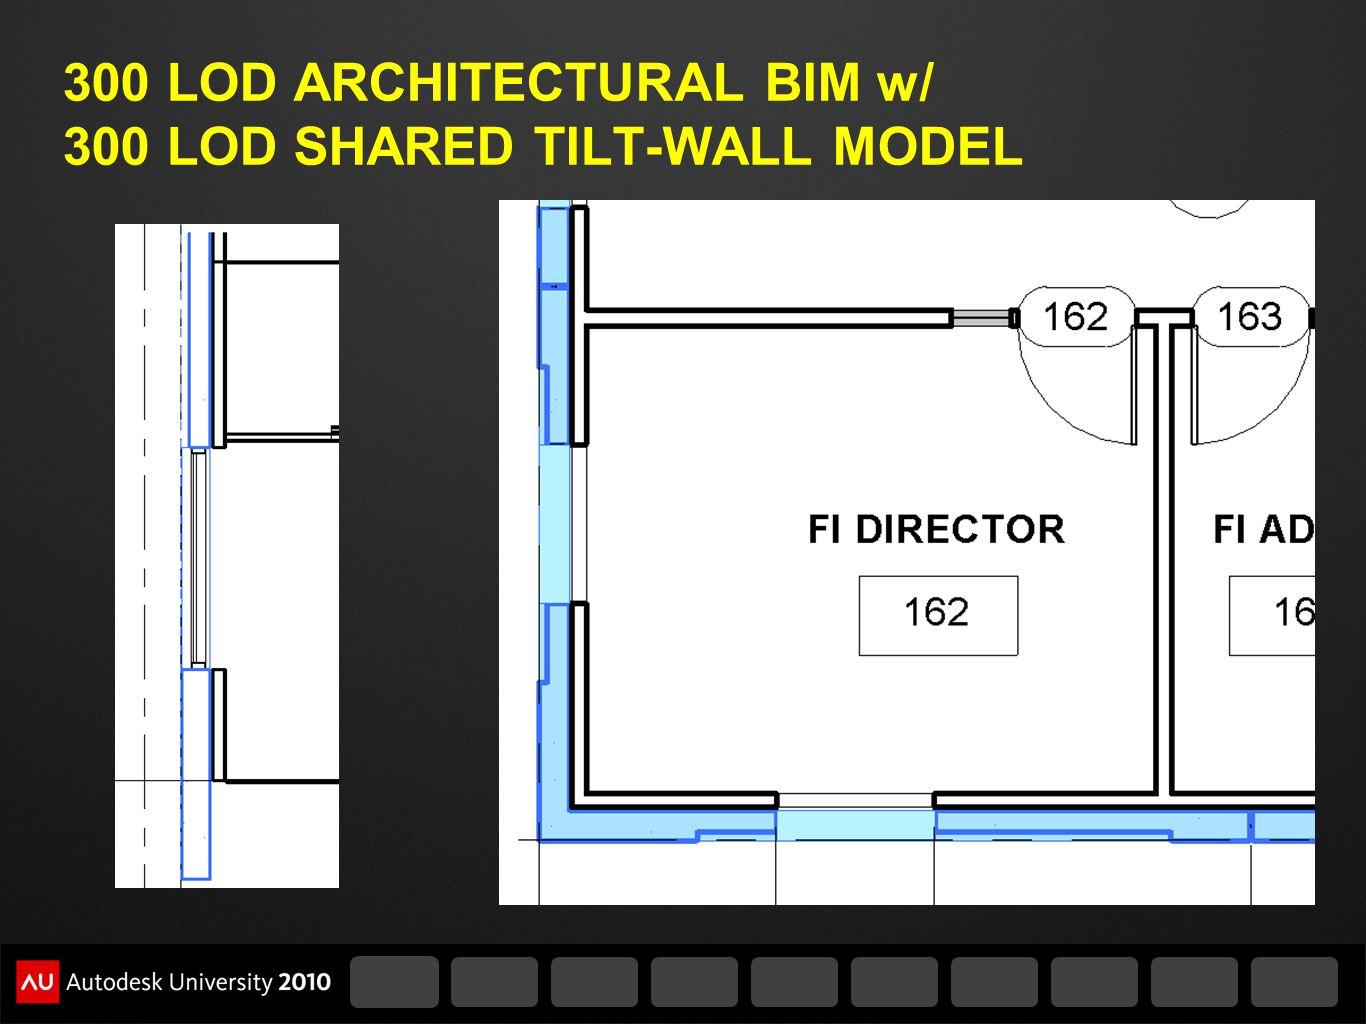 300 LOD ARCHITECTURAL BIM w/ 300 LOD SHARED TILT-WALL MODEL